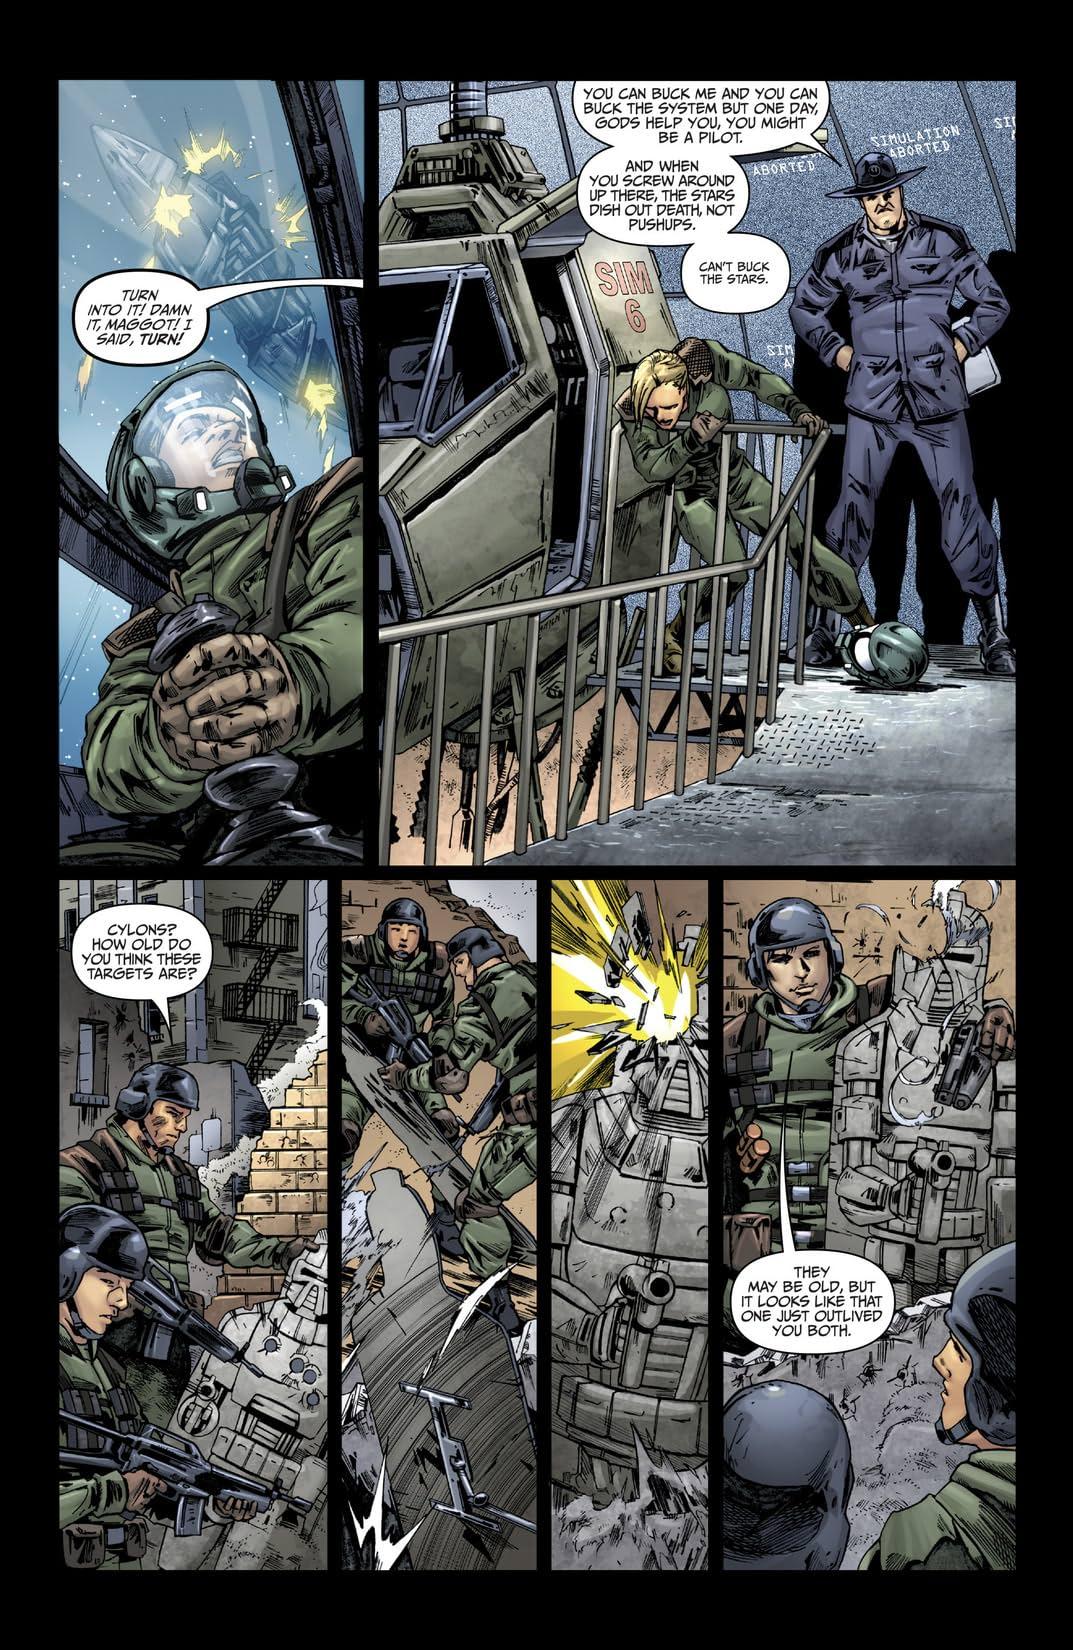 Battlestar Galactica: Origins #9